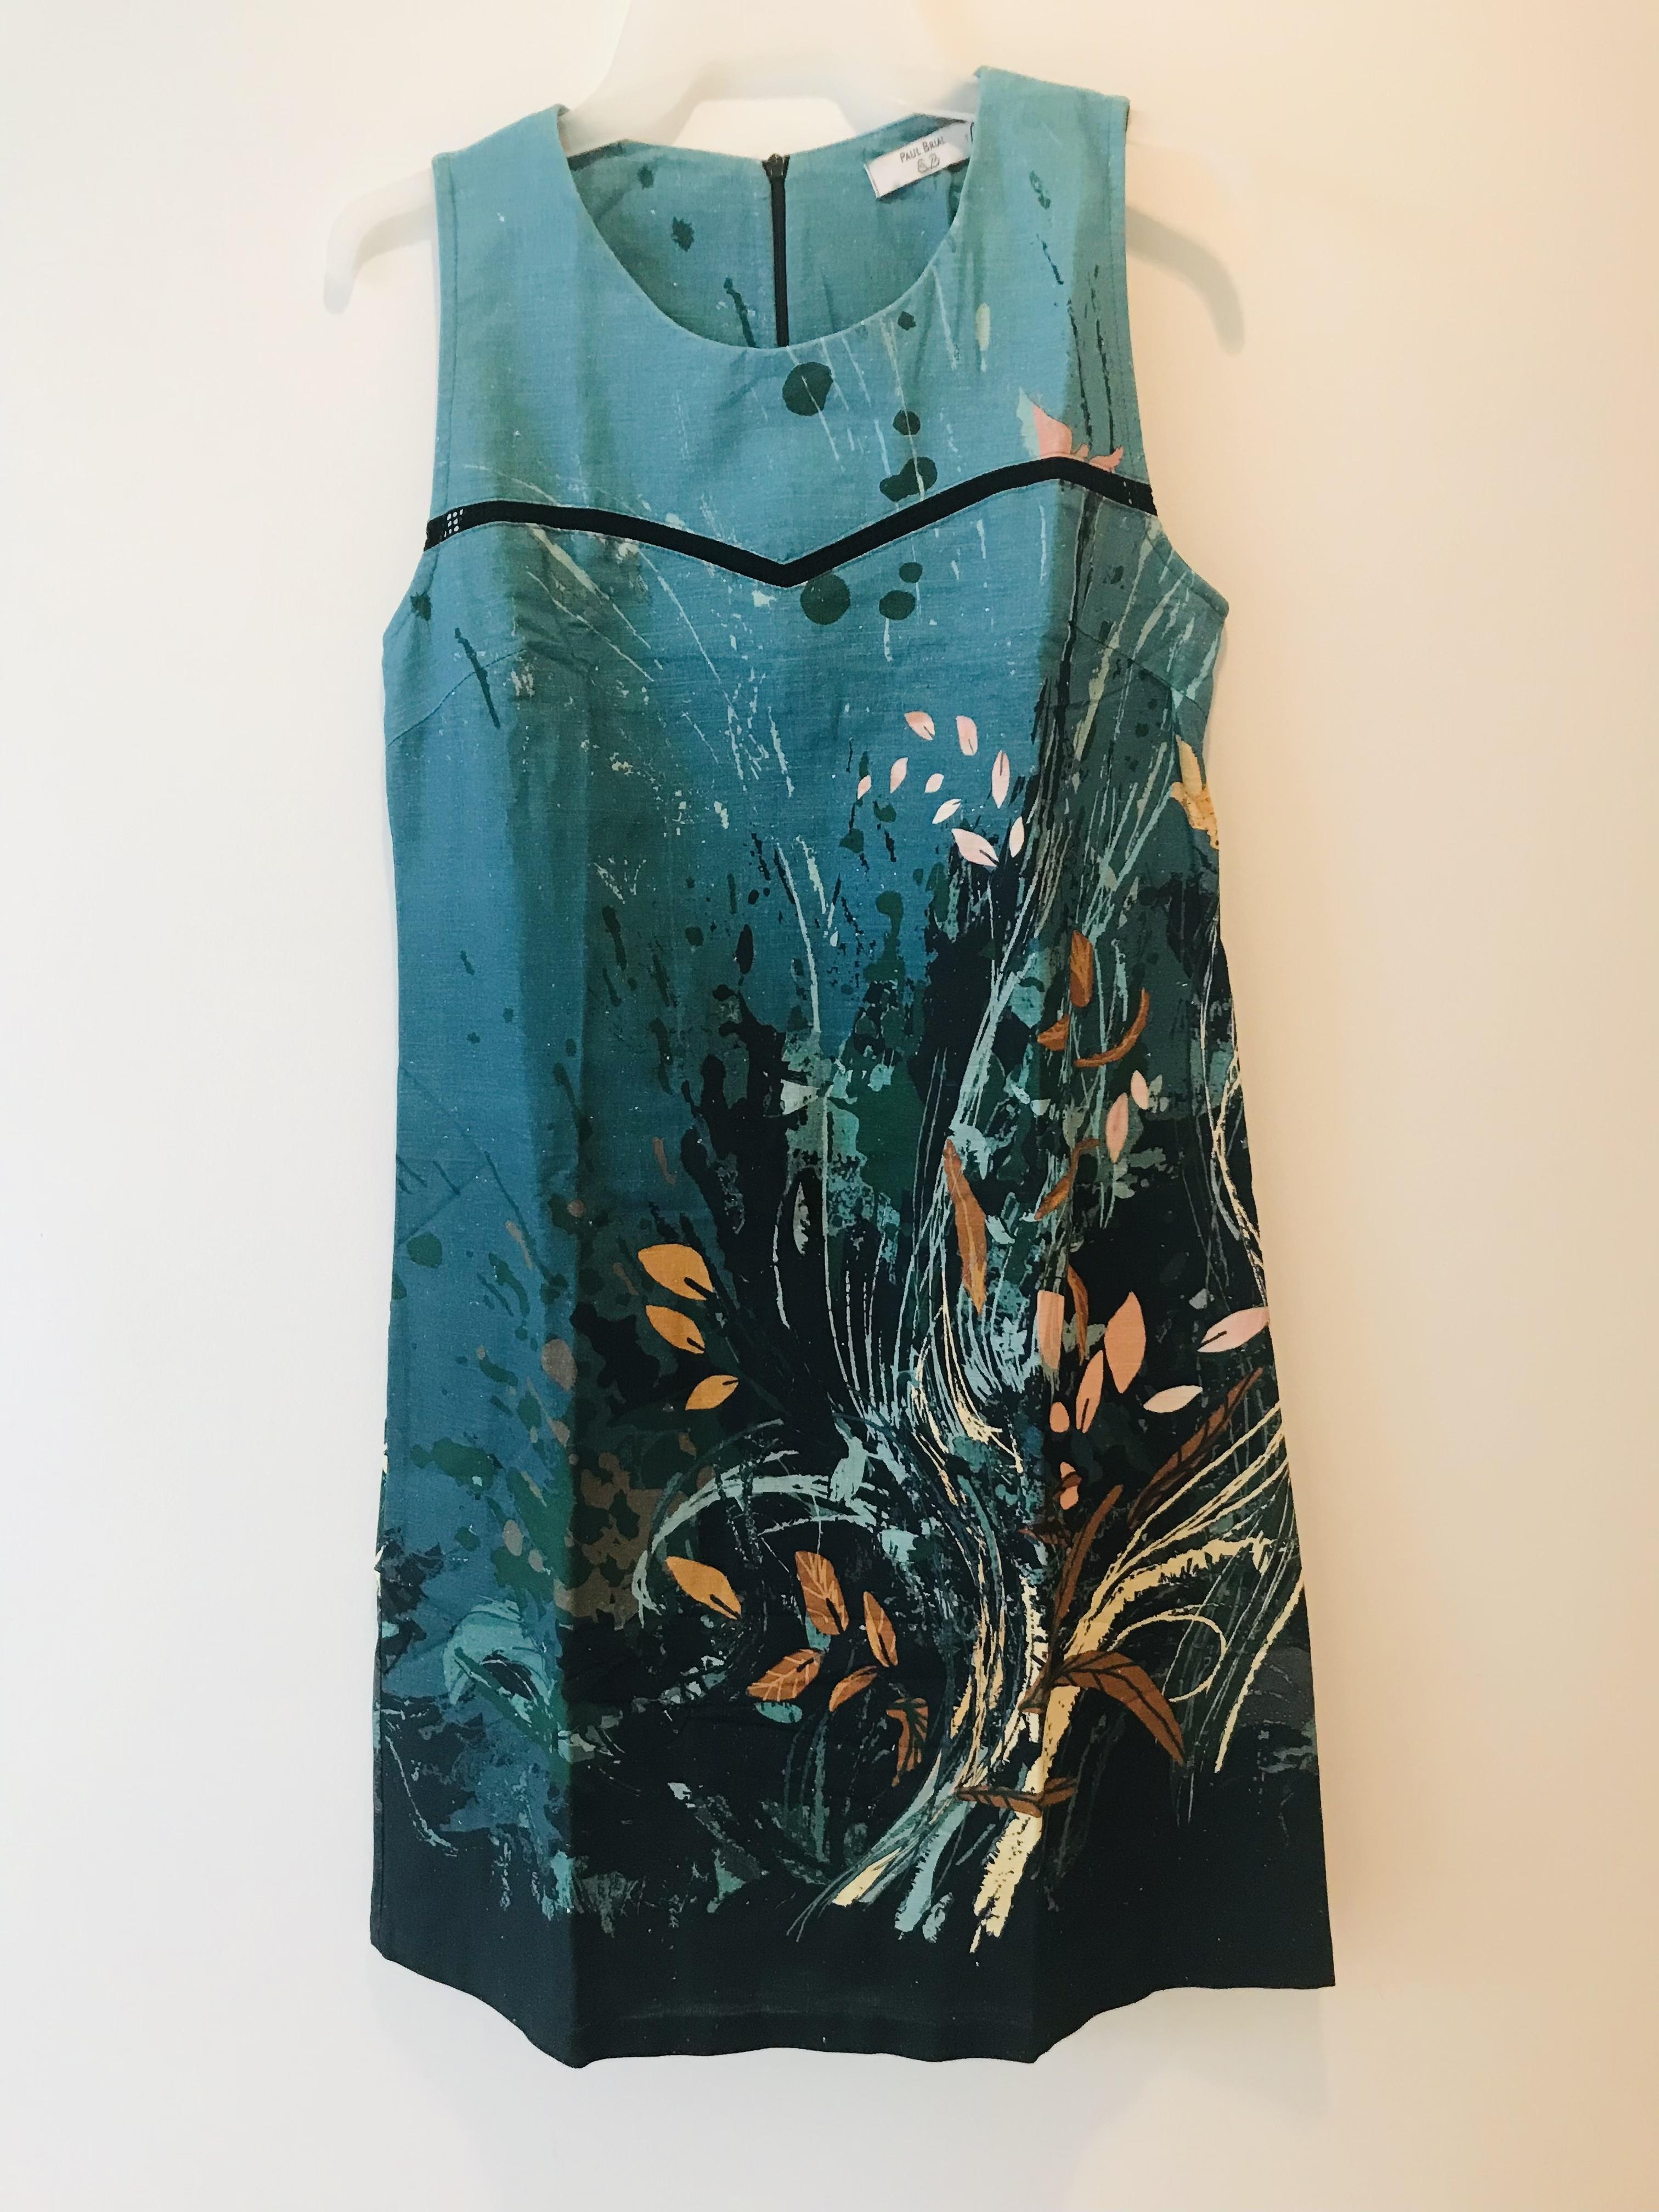 Paul Brial: Underwater Flight Abstract Art Flared Midi Dress (1 Left!) PB_PLUME